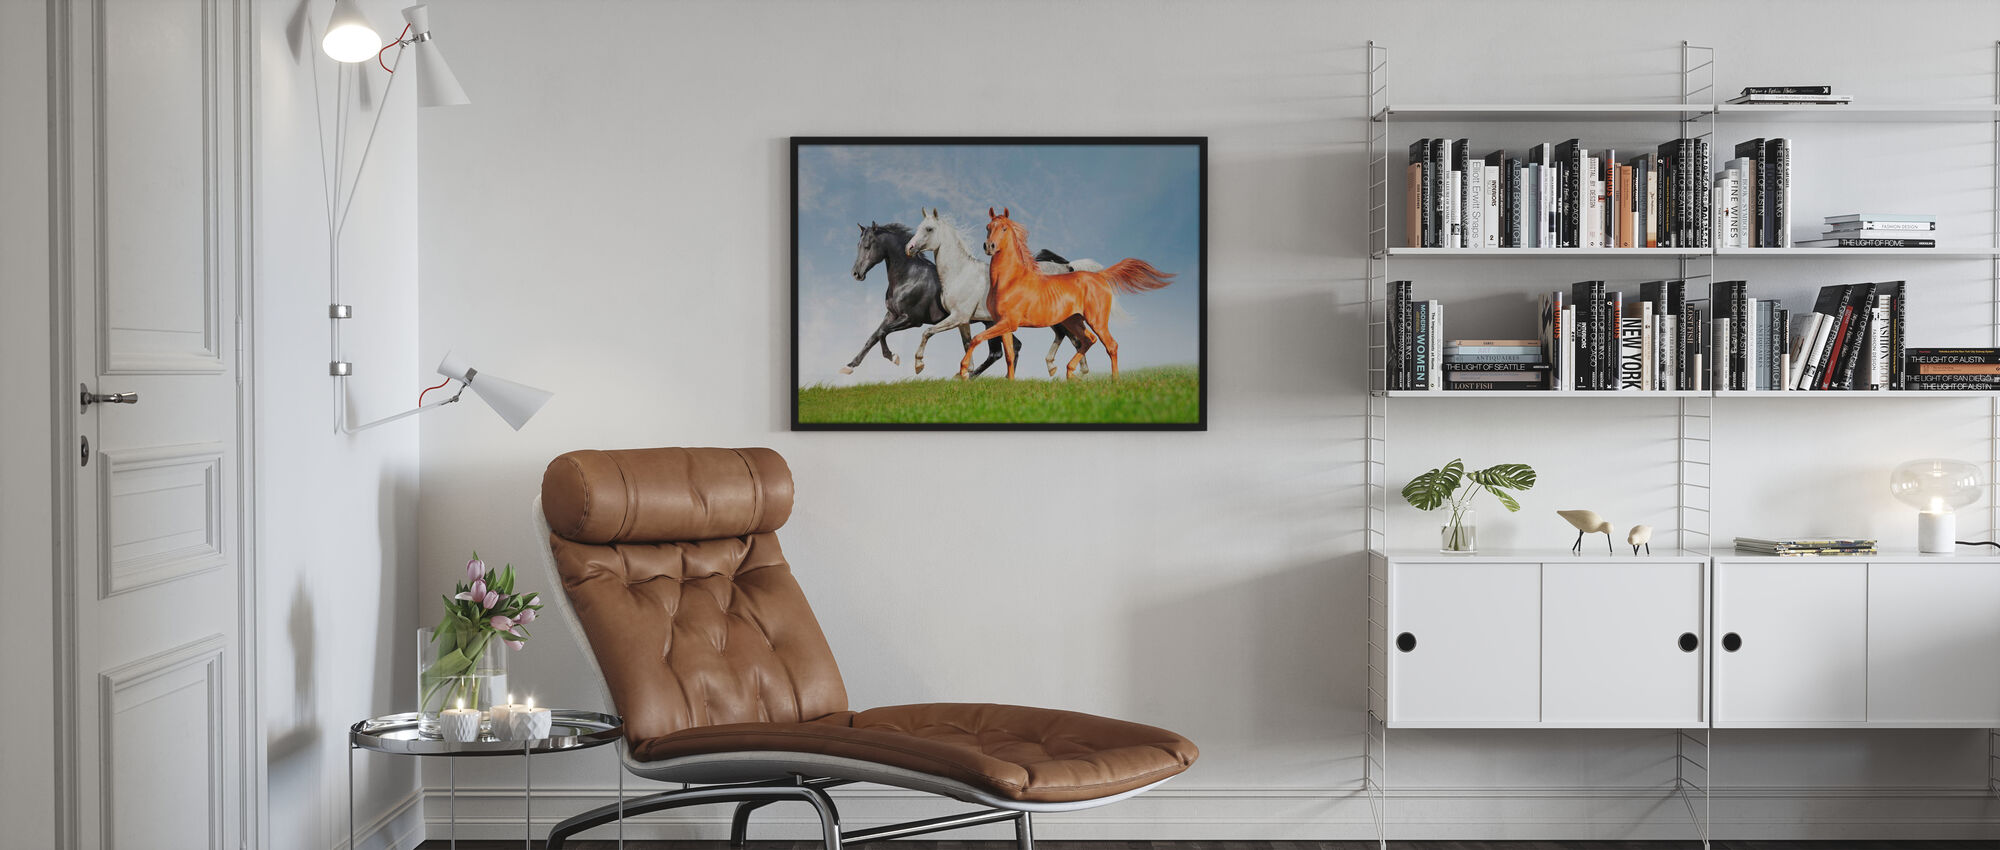 Arabiska hästar springa gratis - Inramad tavla - Vardagsrum